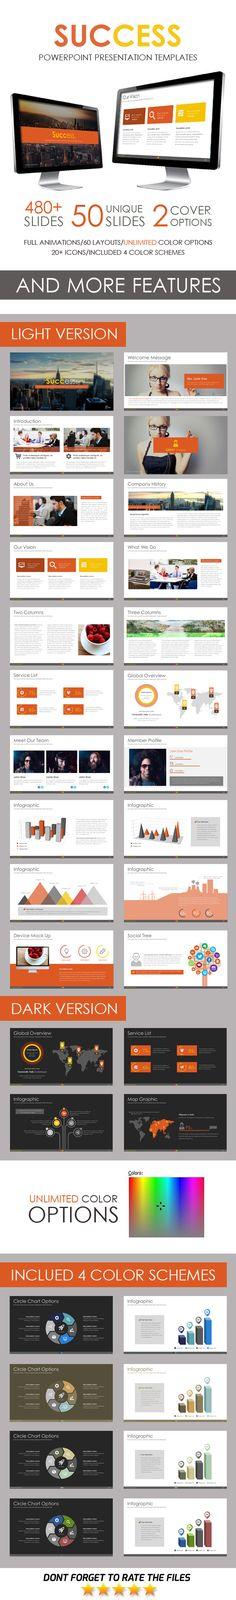 Success PowerPoint Template #design #slides Download: http://graphicriver.net/item/success-powerpoint-template/12703331?ref=ksioks